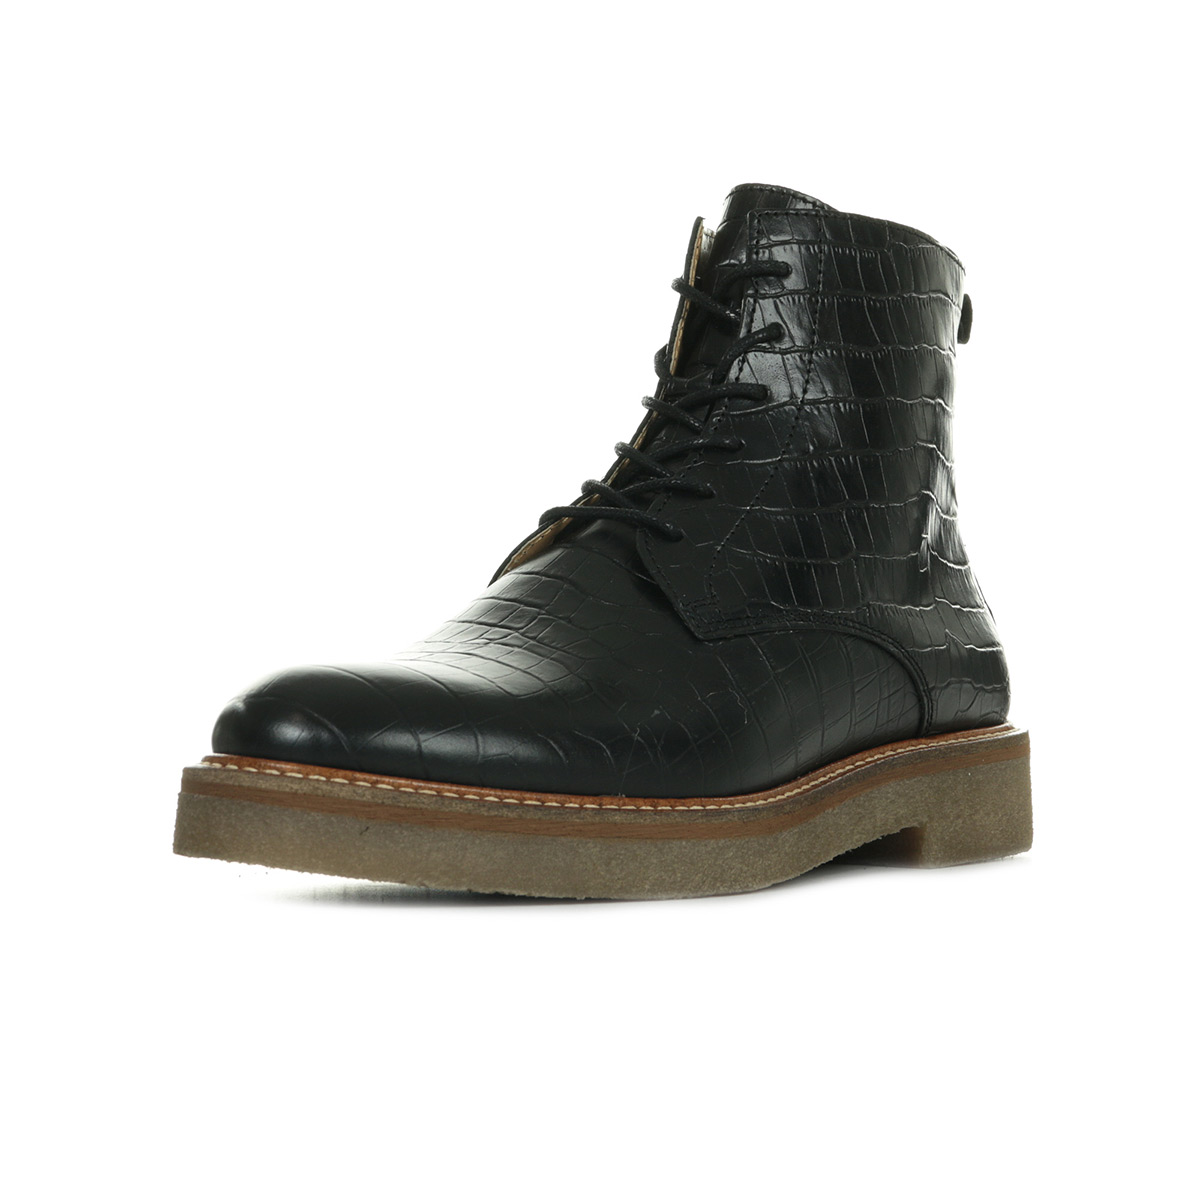 ea06fdfaaccd Kickers Oxigeno Noir 655562508